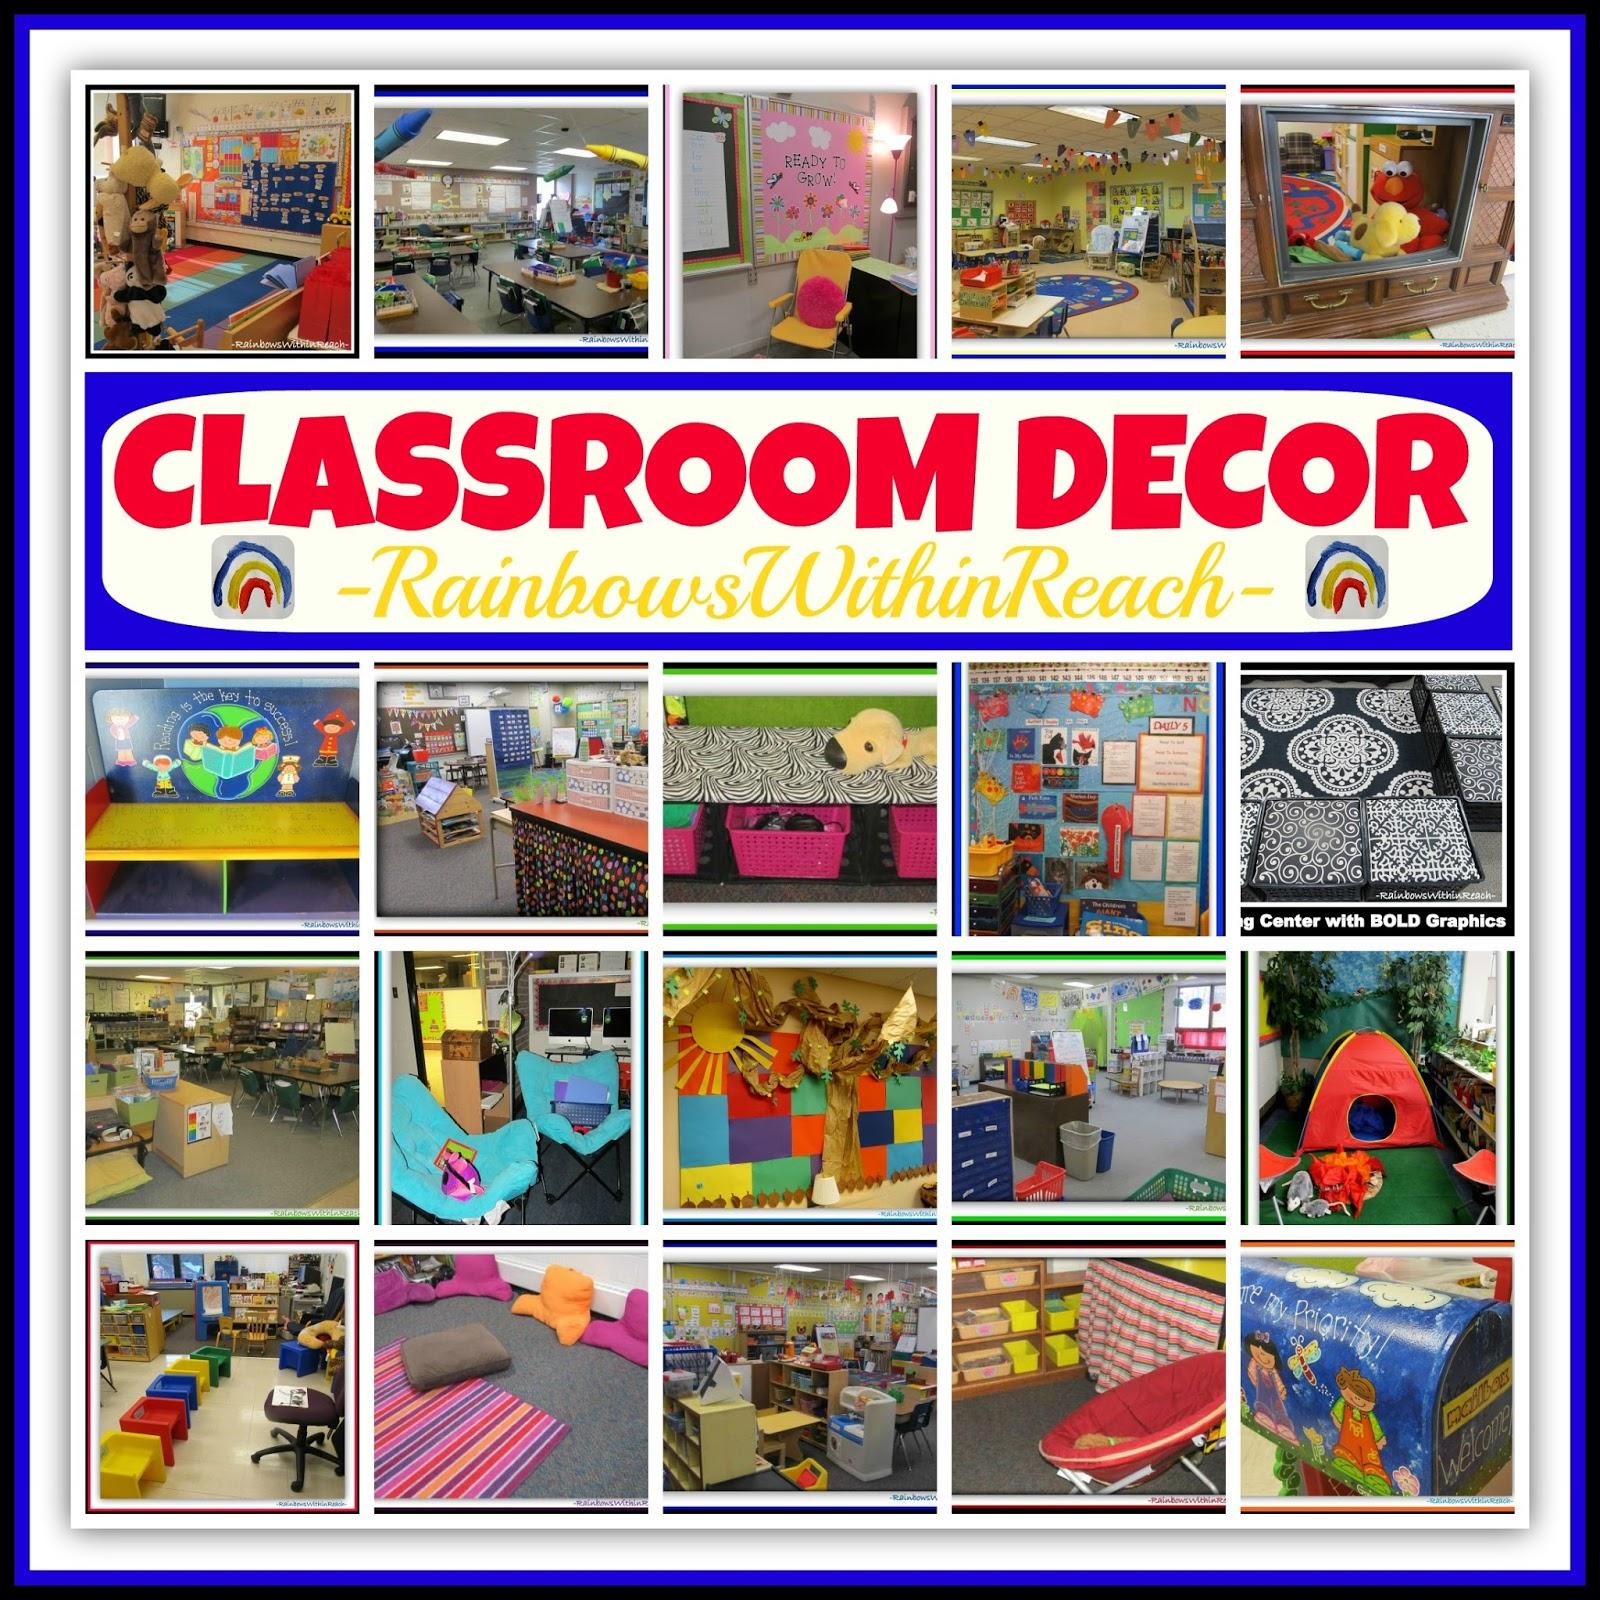 Classroom Decor S ~ Rainbowswithinreach spot